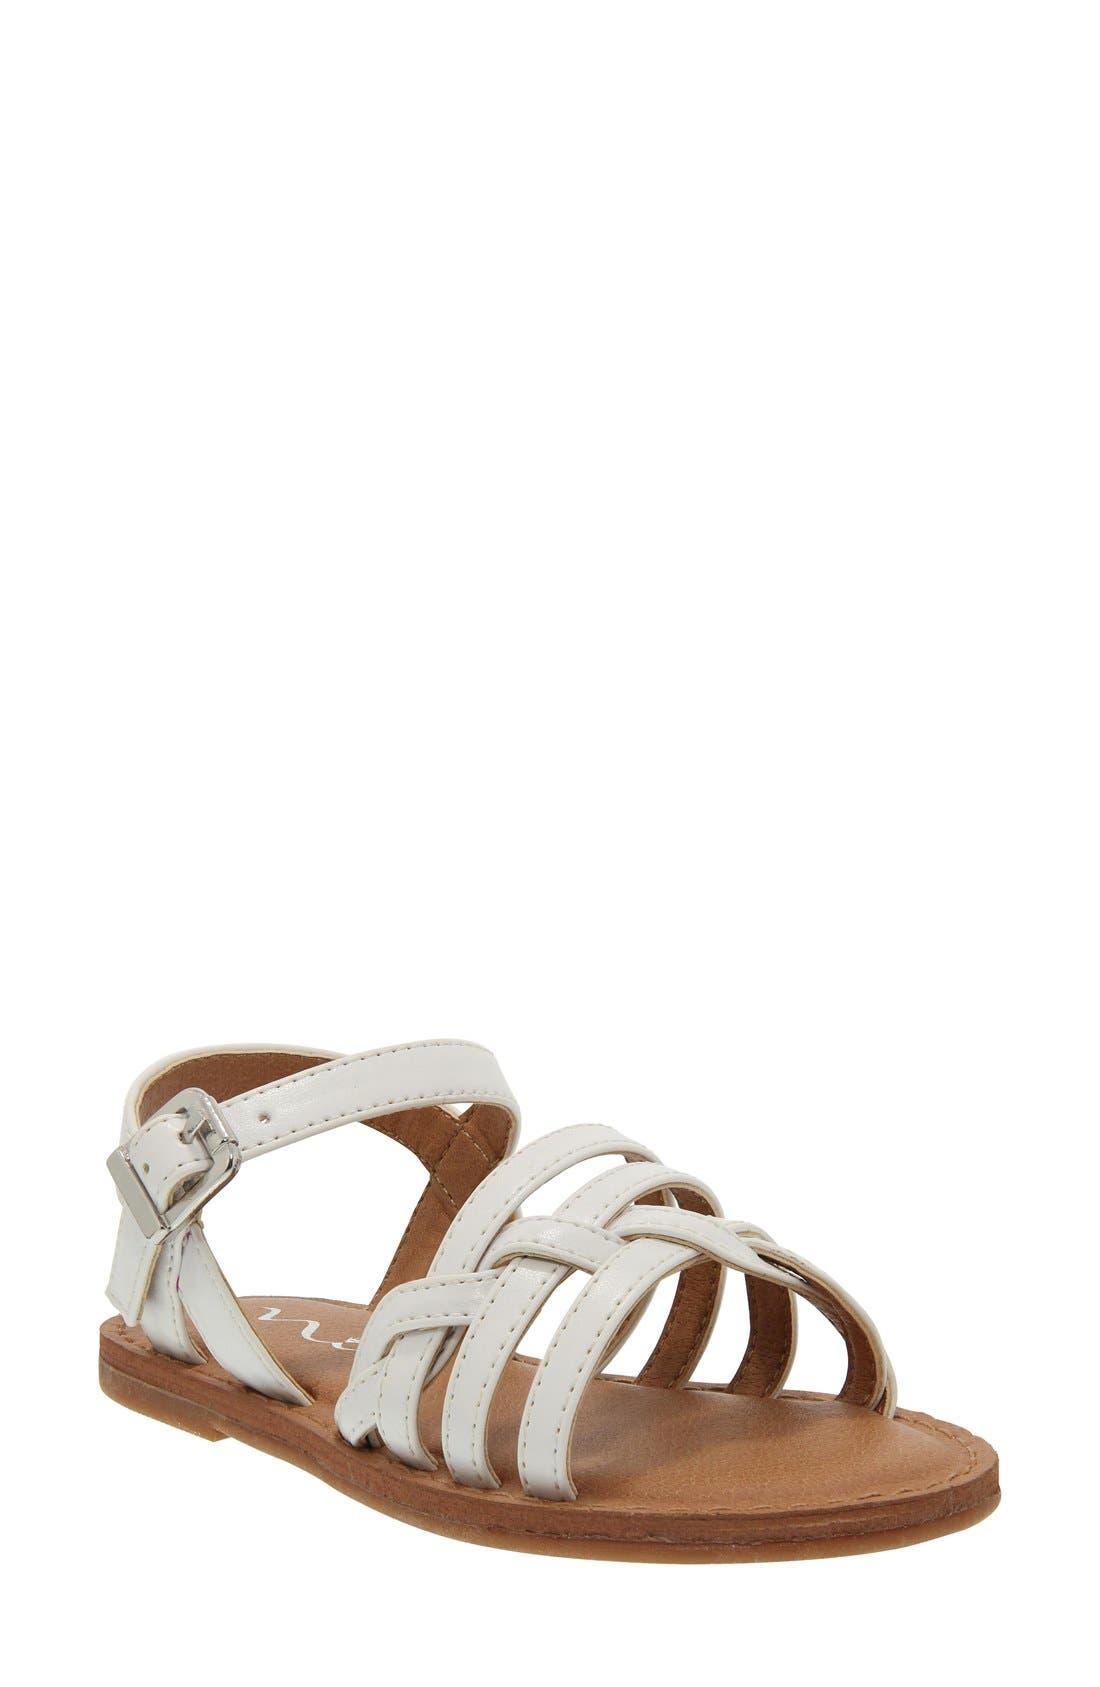 Alternate Image 1 Selected - Nina 'Clari' Sandal (Walker & Toddler)